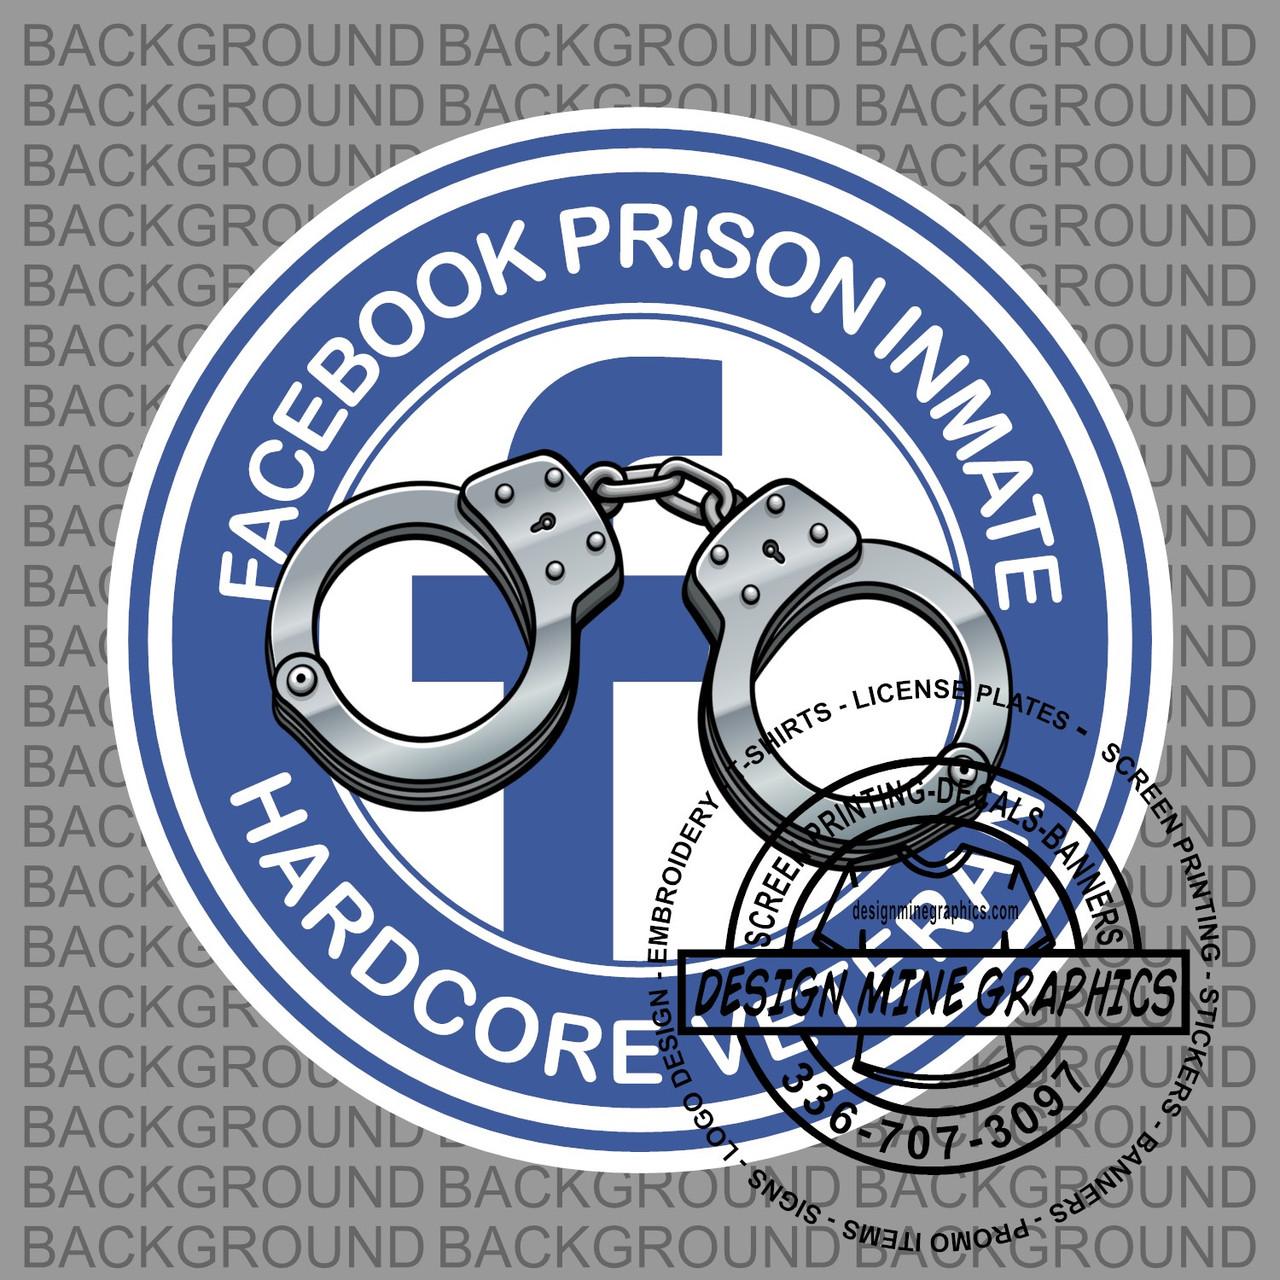 https://cdn1.bigcommerce.com/server4700/e904f/products/0/images/782/Facebook_jail_v1_proof__16767.1616464739.1280.1280.jpg?c=2&_ga=2.183660320.706376053.1616464582-1352629106.1592785609